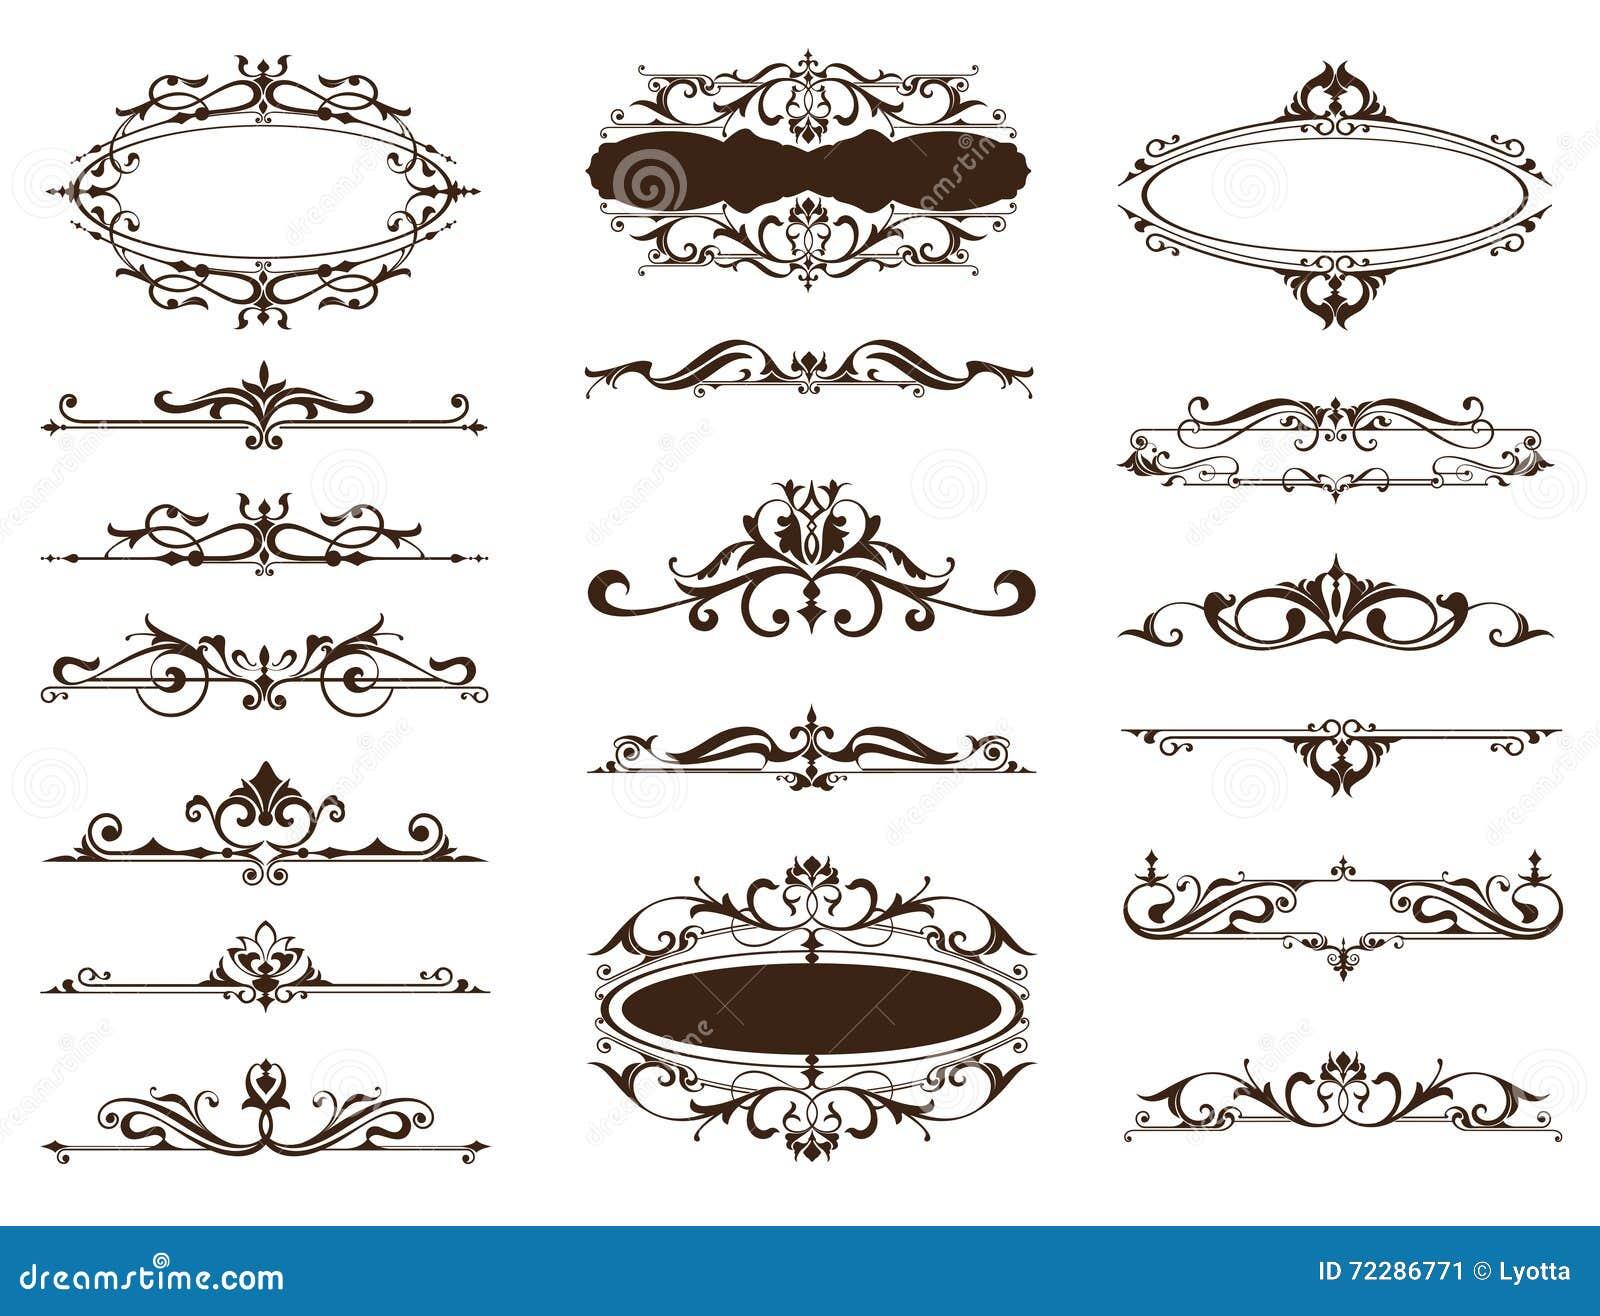 Design vintage ornaments borders frames corners stock for Design ornaments